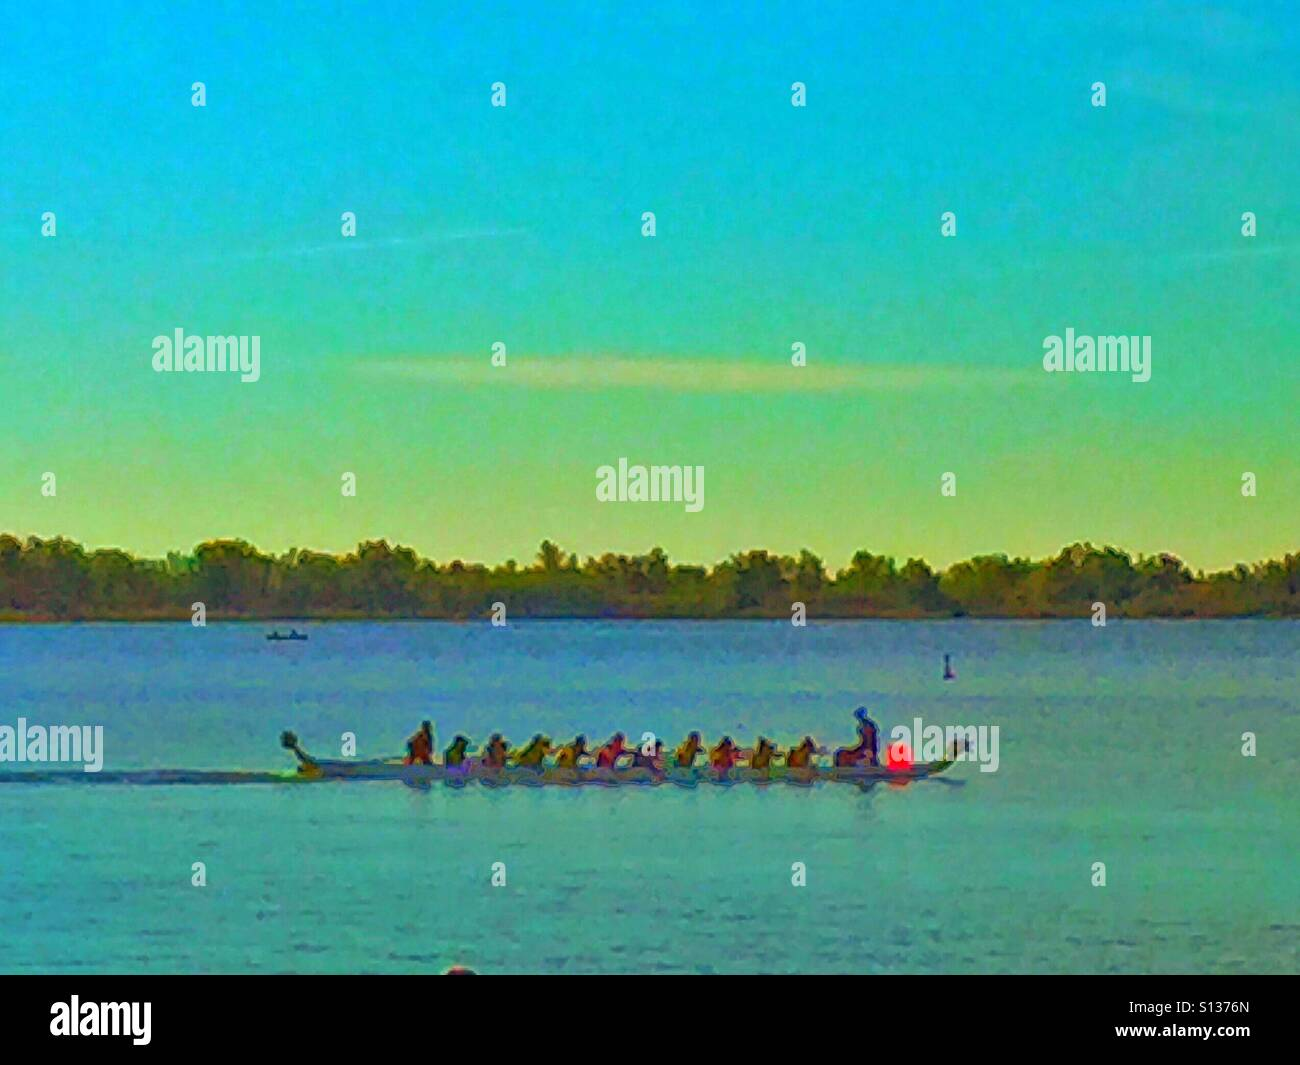 Dragon boat races - Stock Image